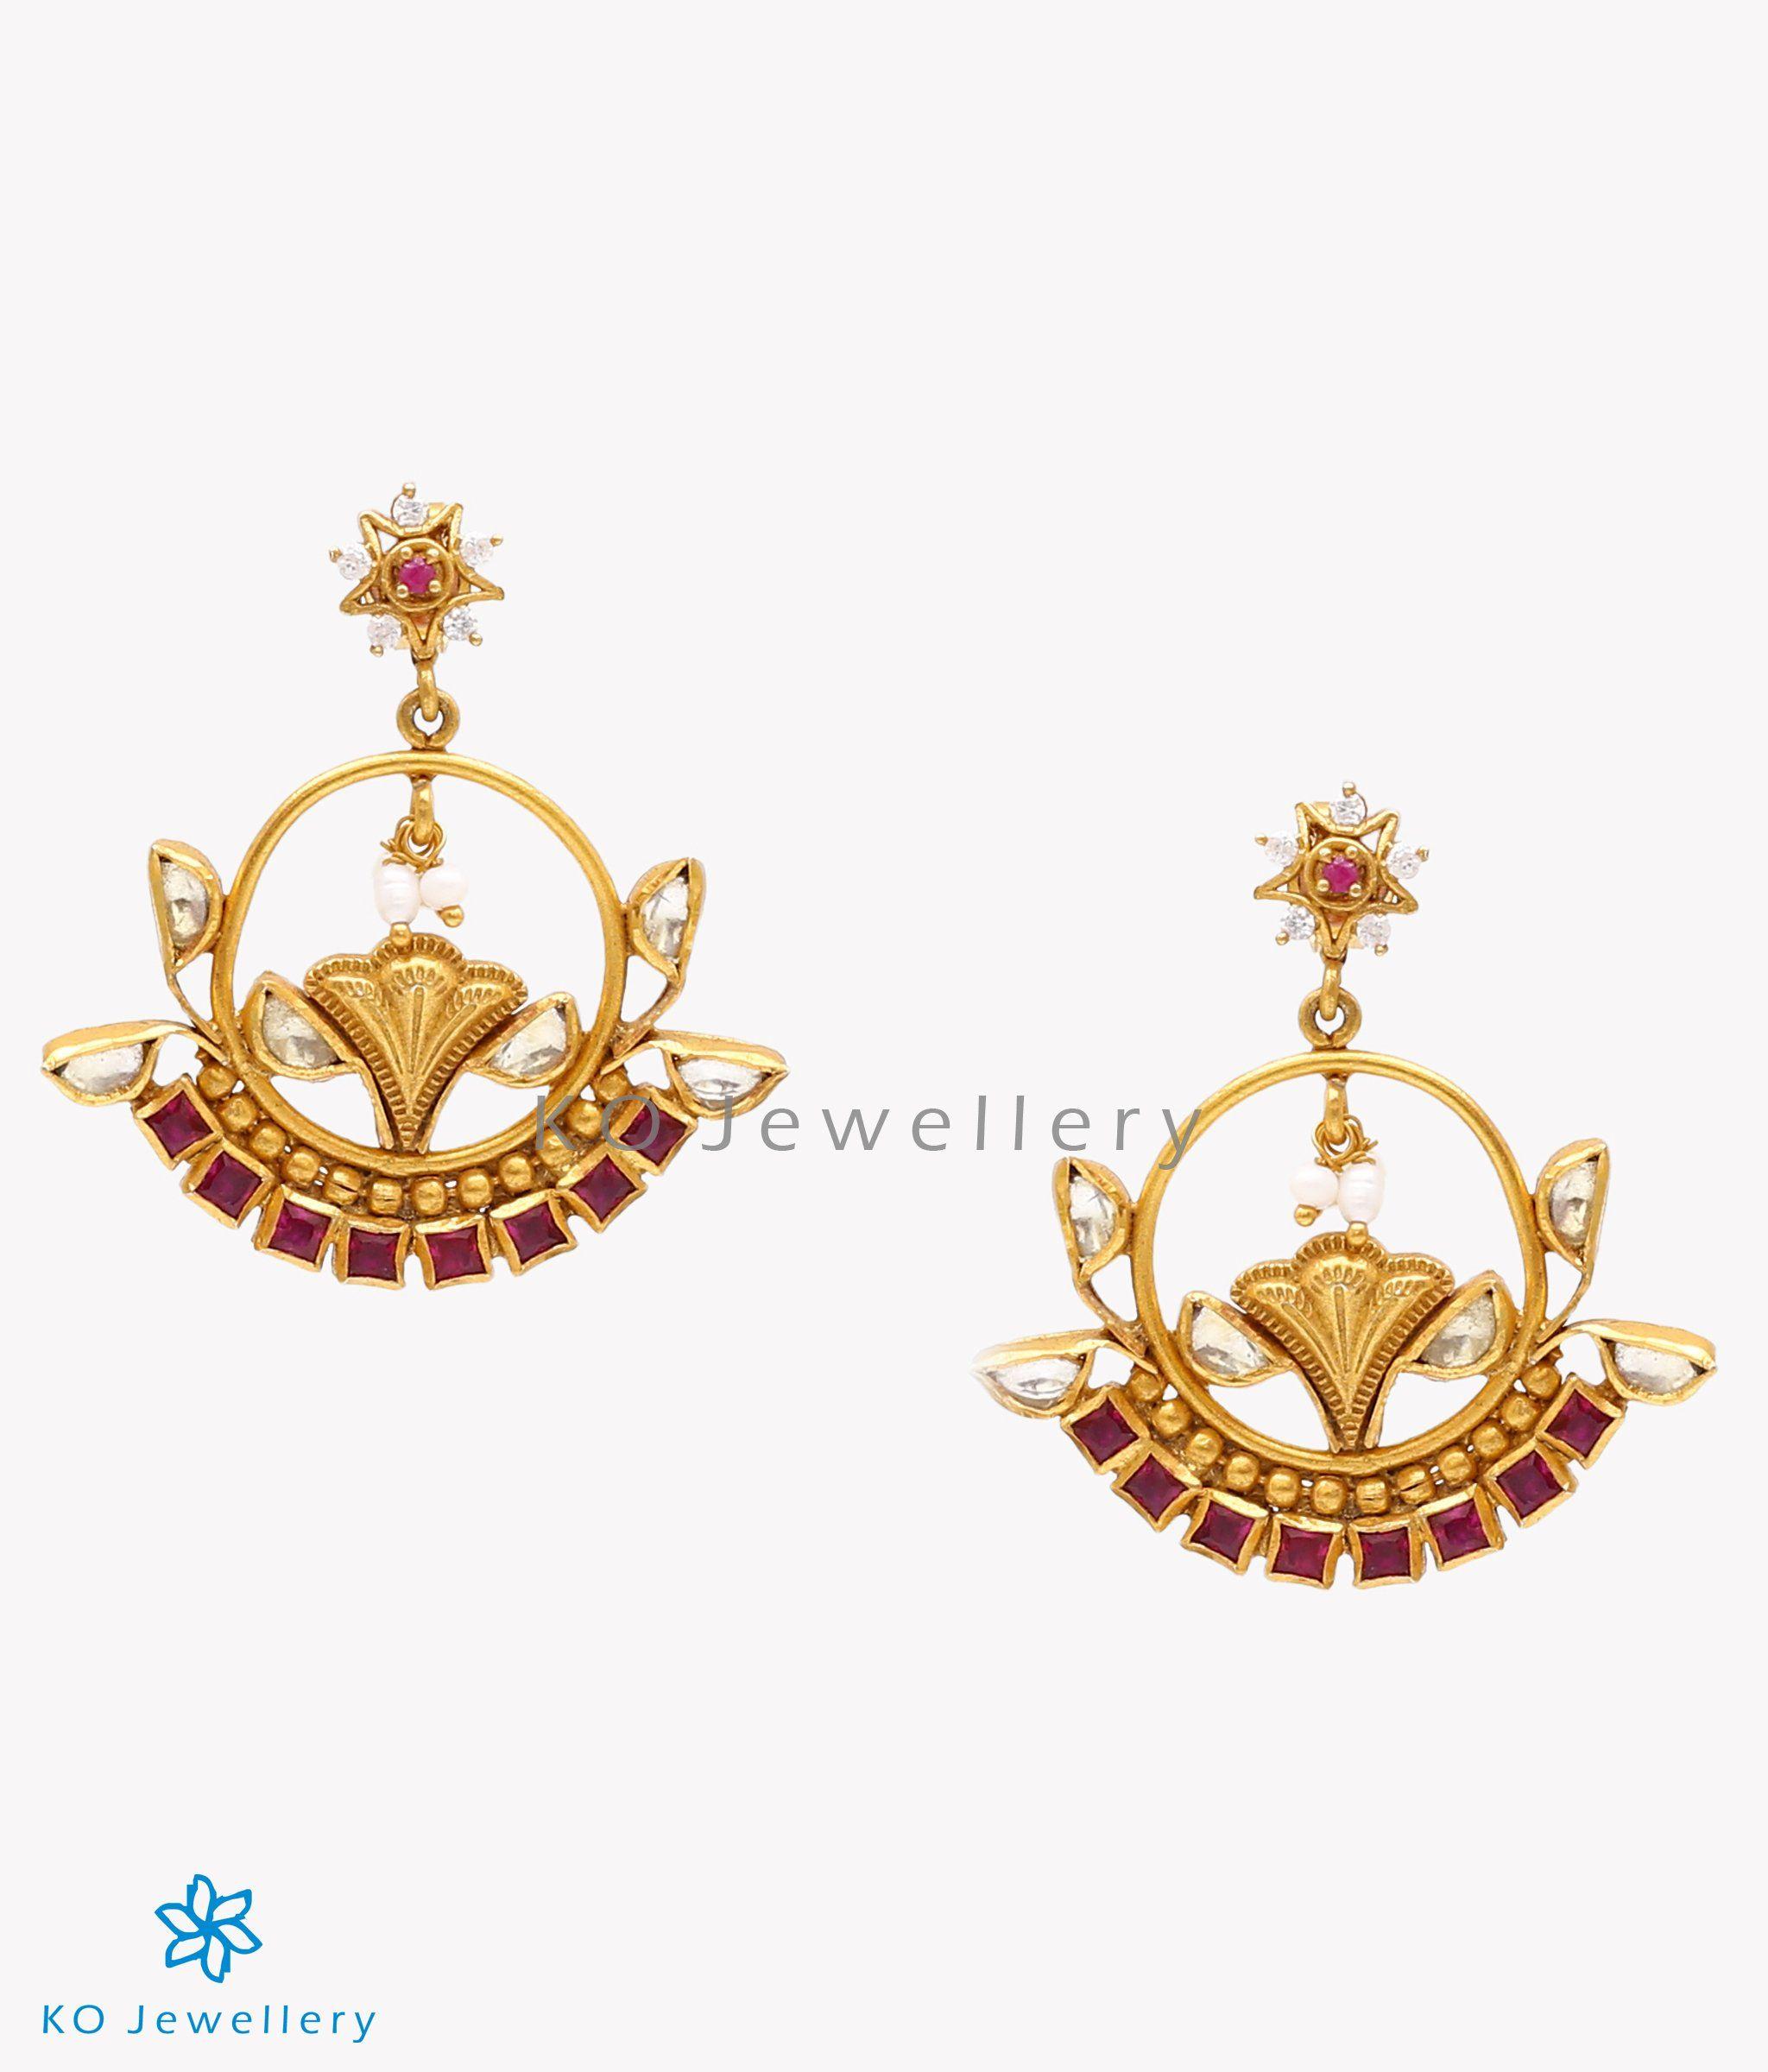 0aed24e8e The Nazm Silver Kundan Earrings-Buy jadau jewellery from jaipur online - KO  Jewellery